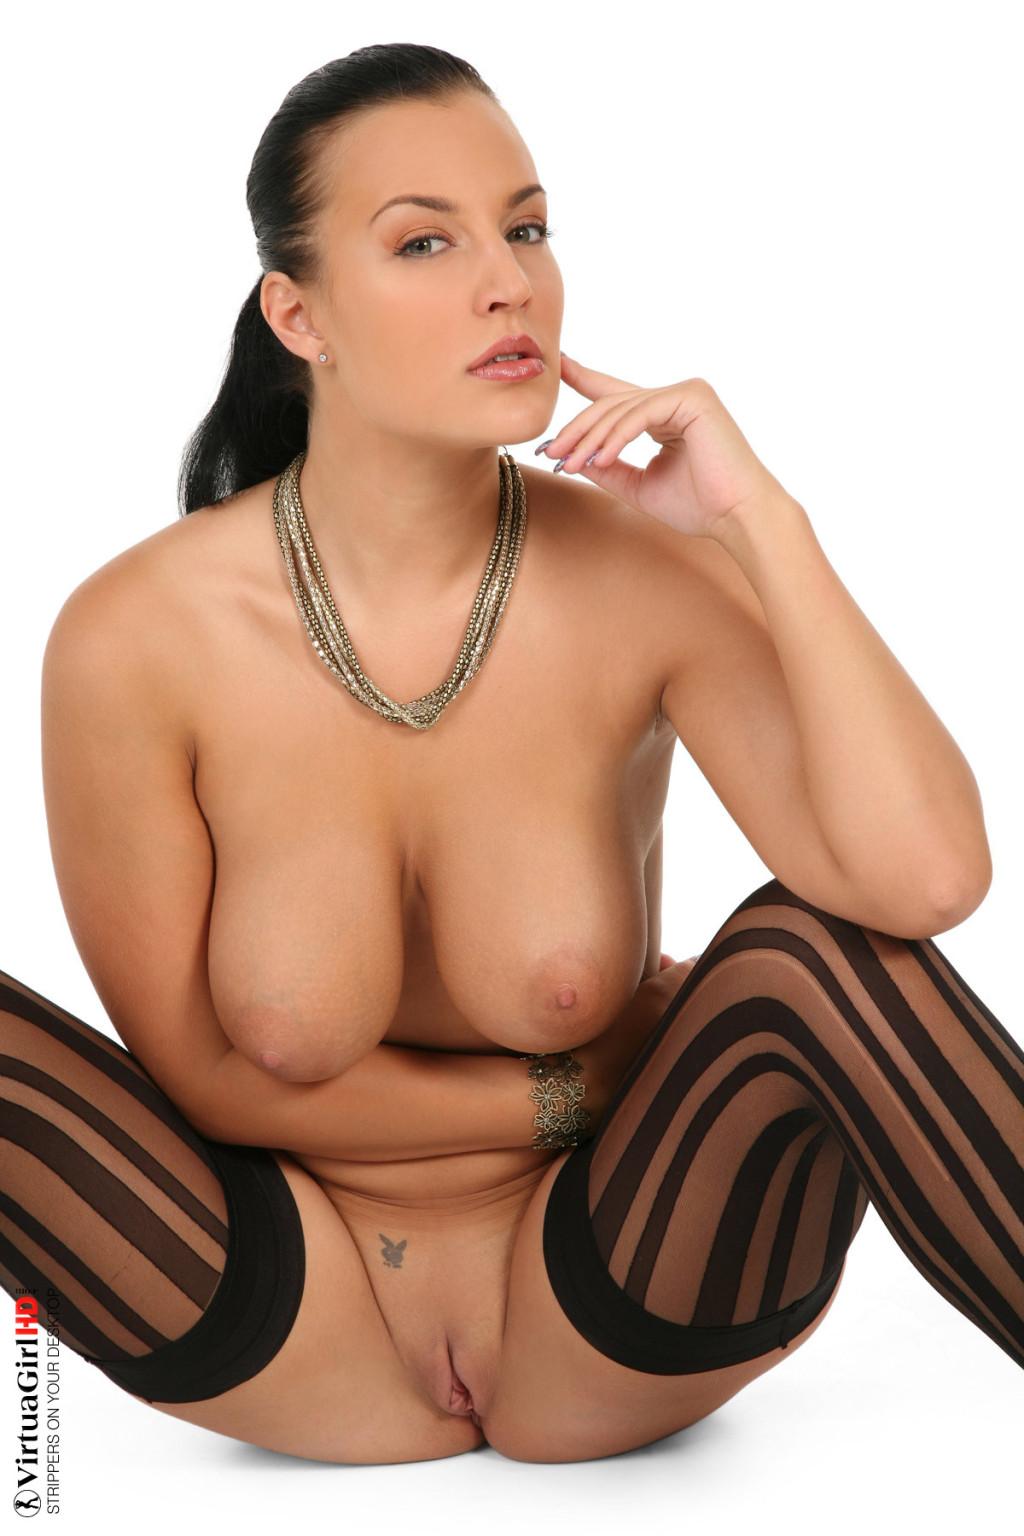 Twistys erica campbell nude